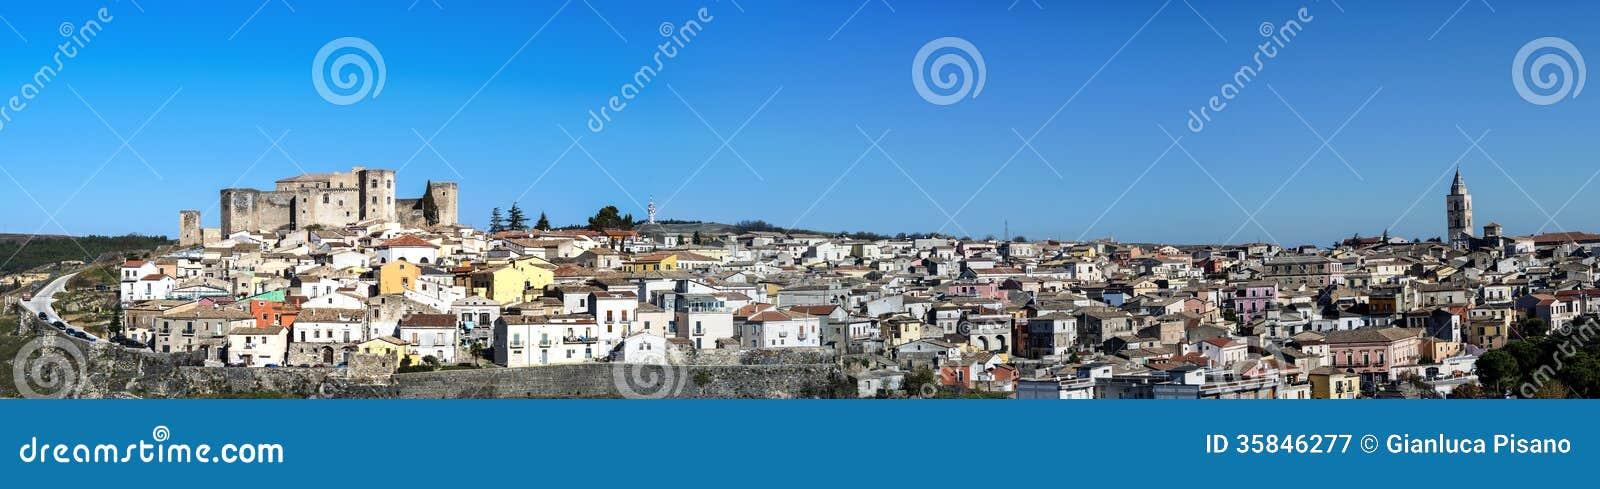 Melfi panoramic landscape